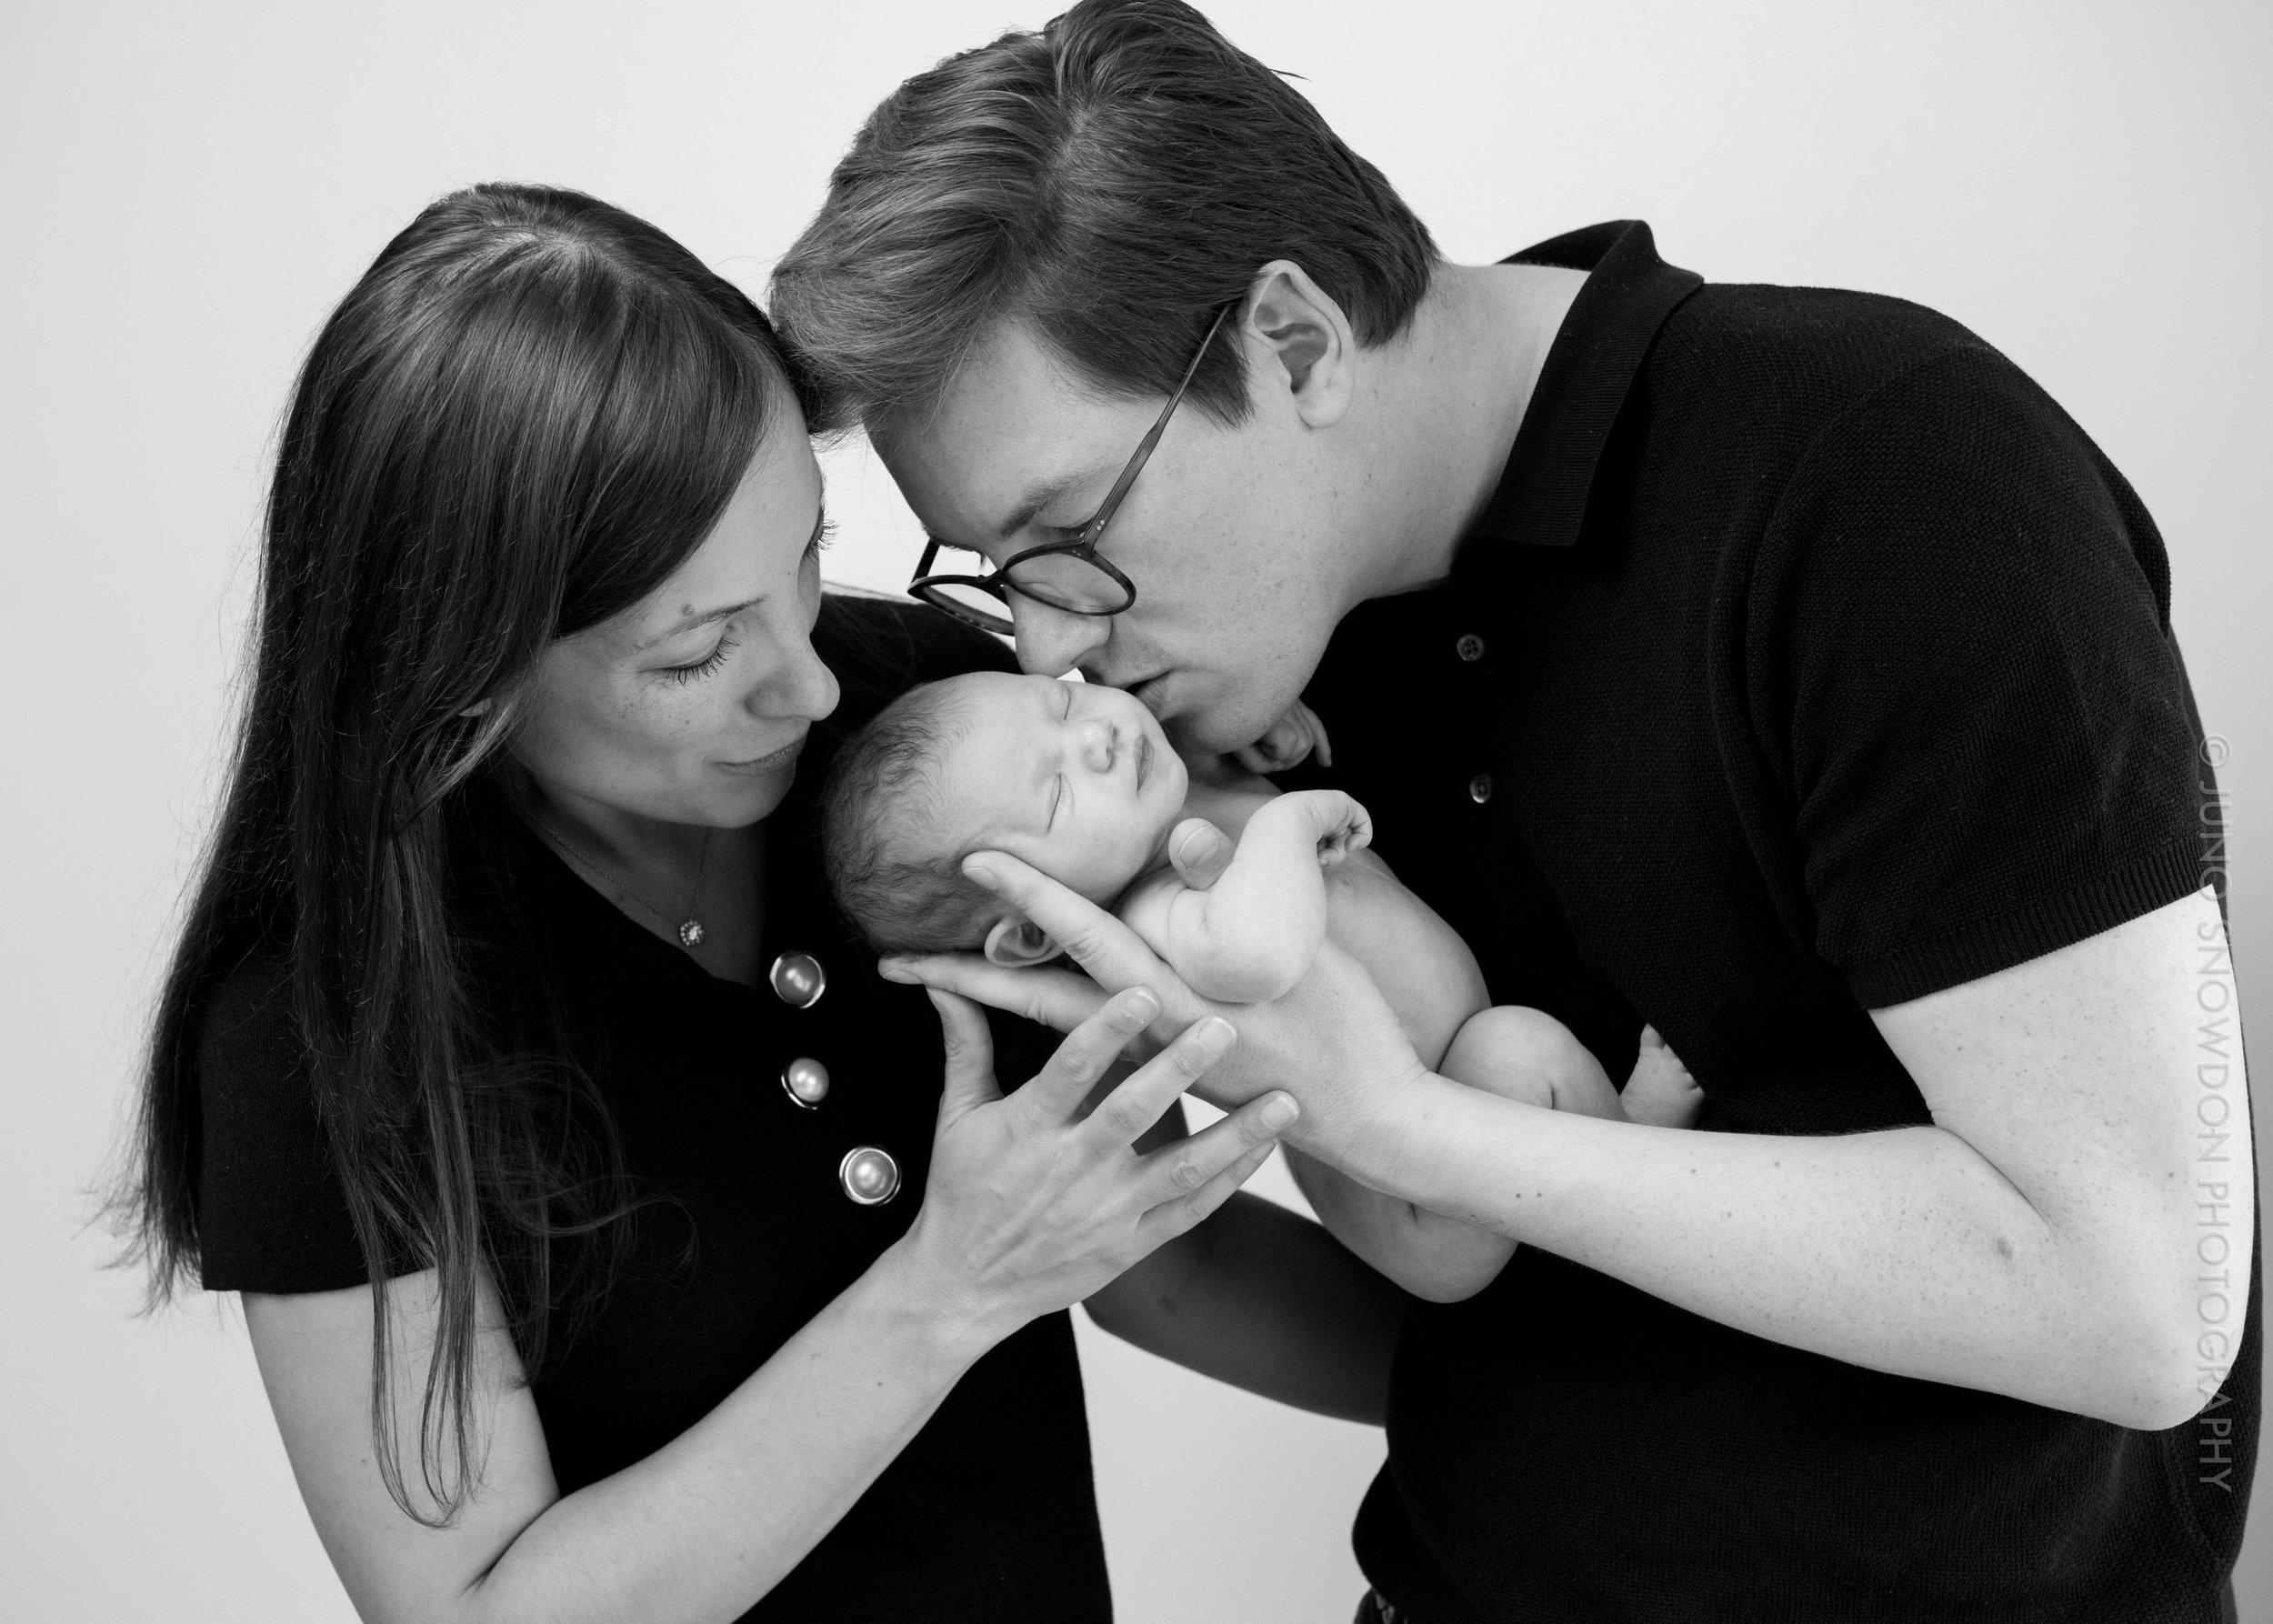 juno-snowdon-photography-newborn-portrait-7152.jpg